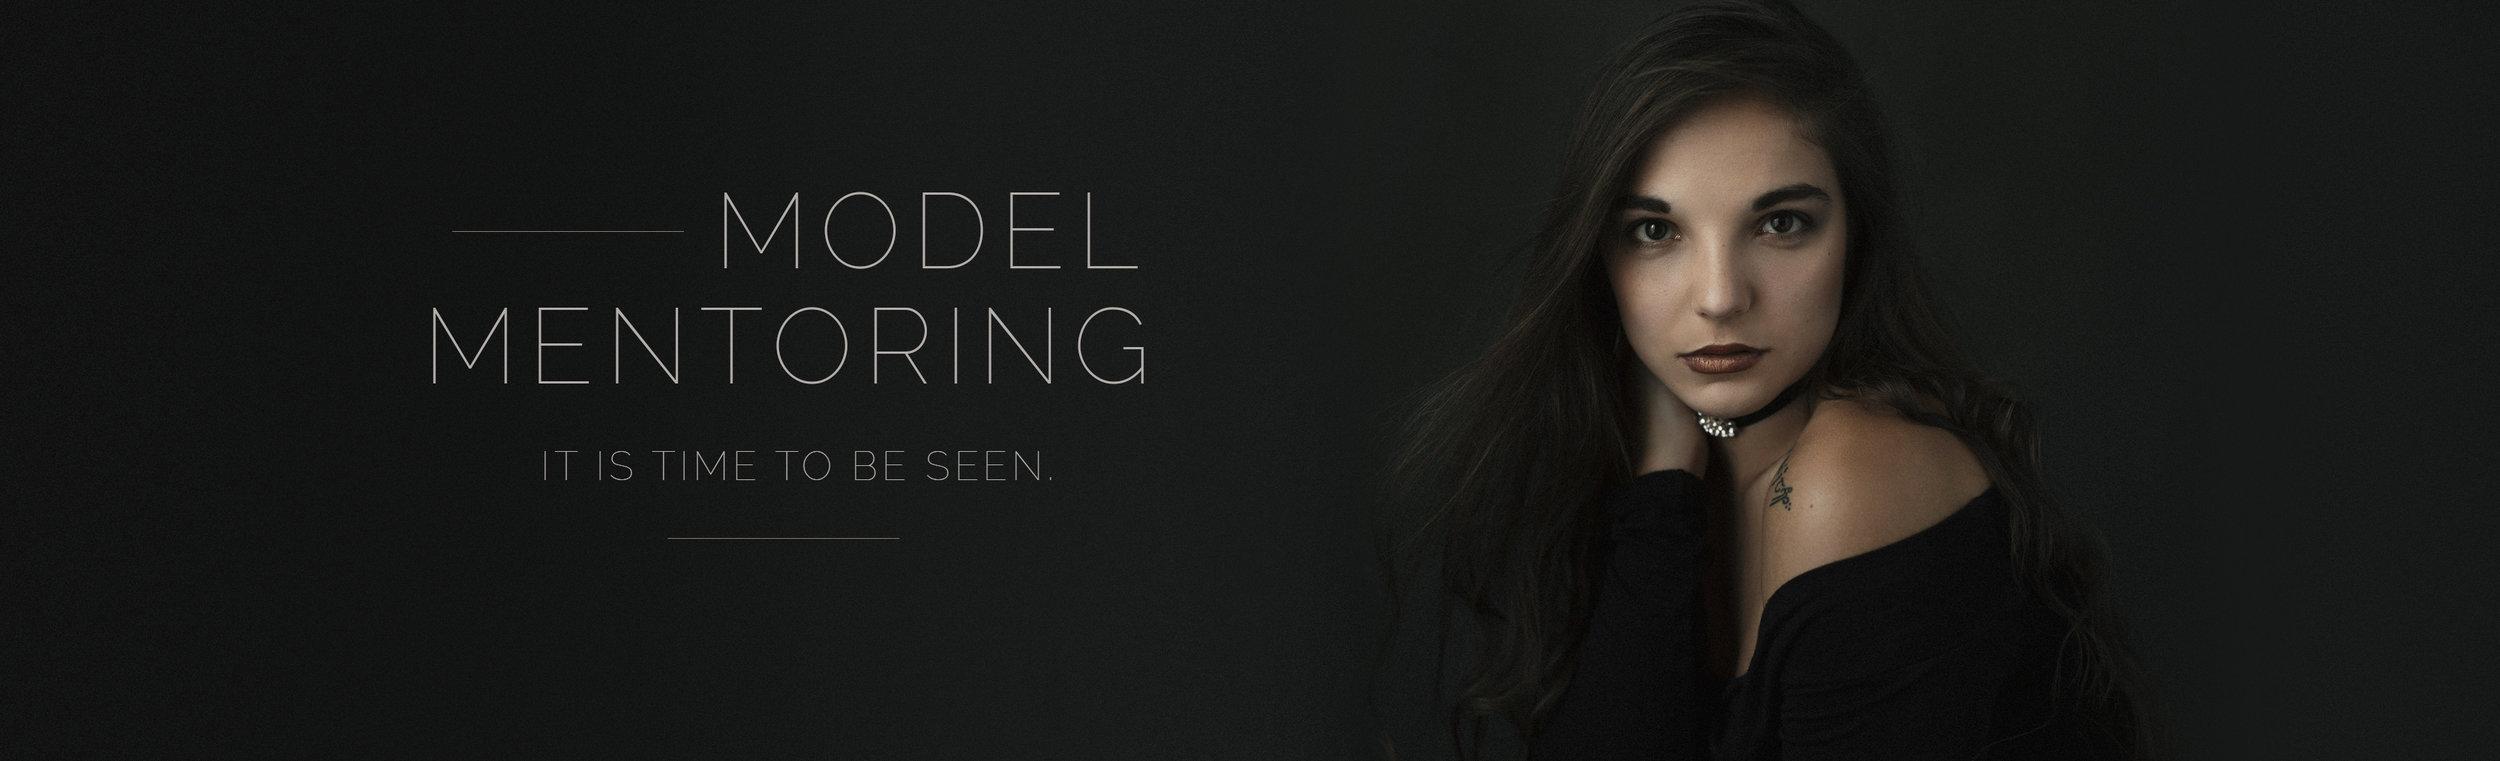 Model Mentoring 1.jpg